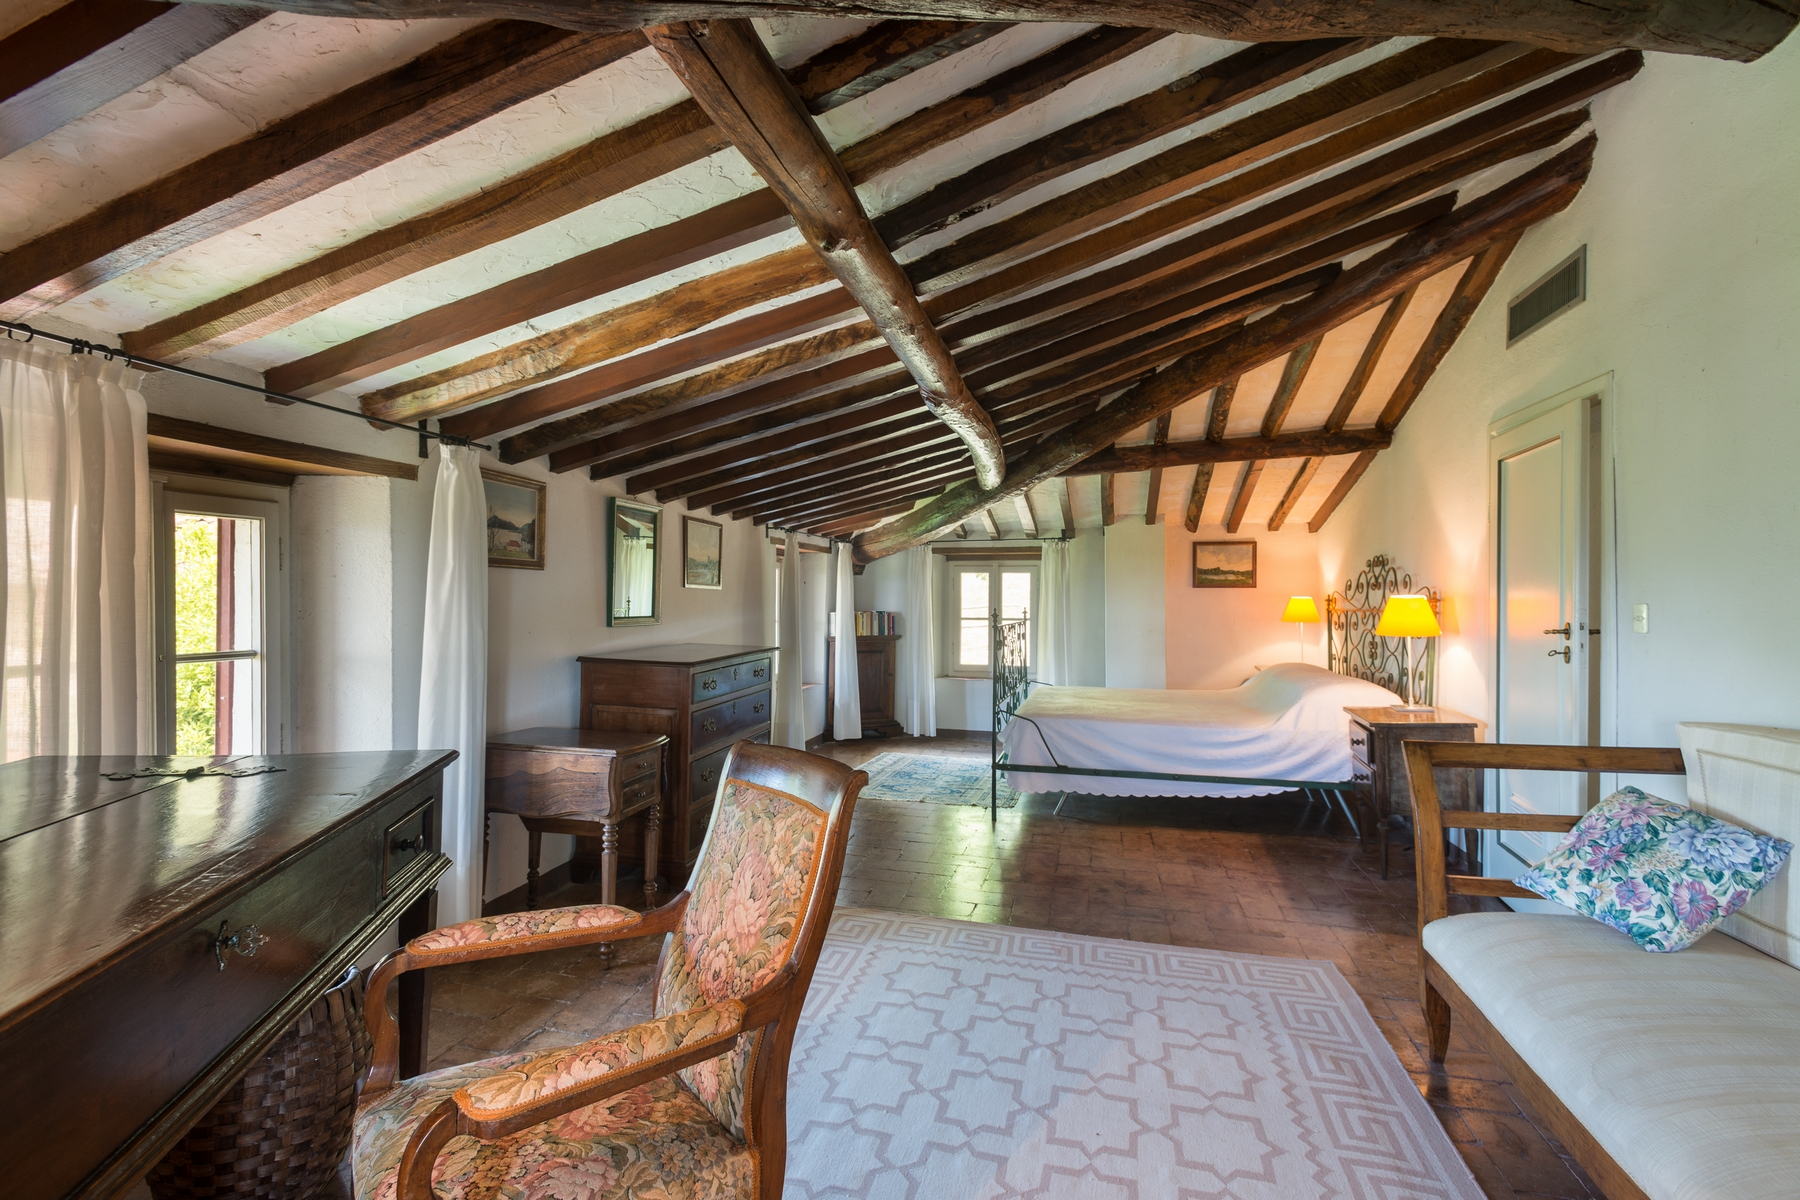 Villa in Vendita a Lucca: 5 locali, 550 mq - Foto 12